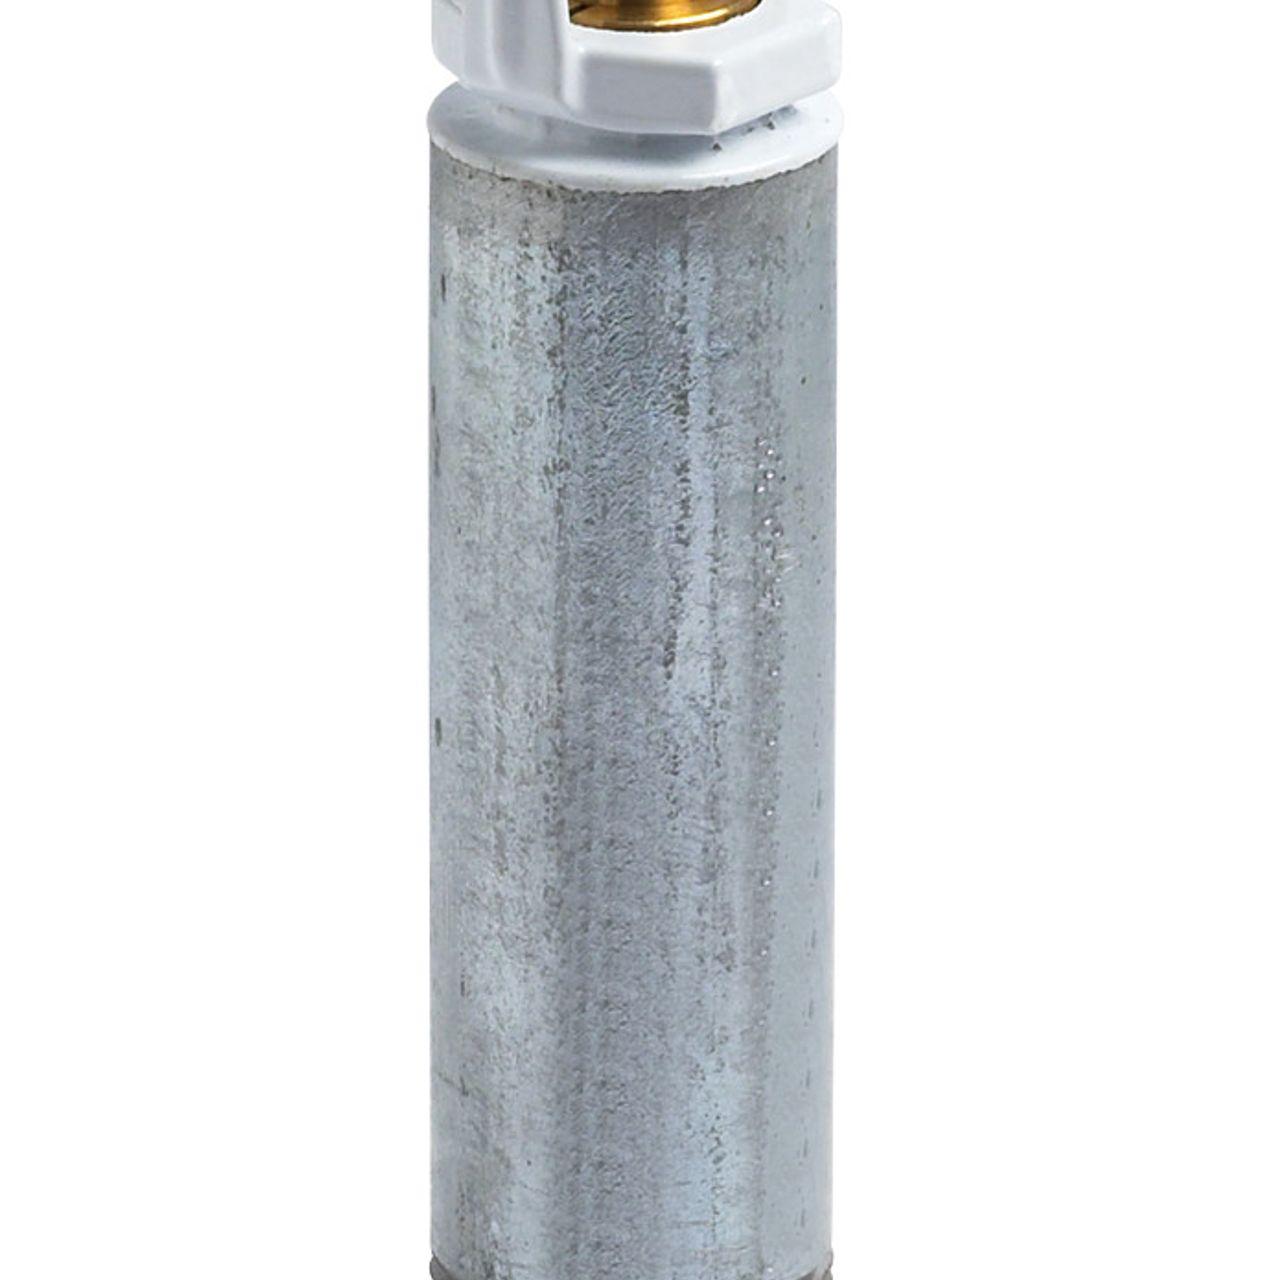 FireLock™ Model V3603